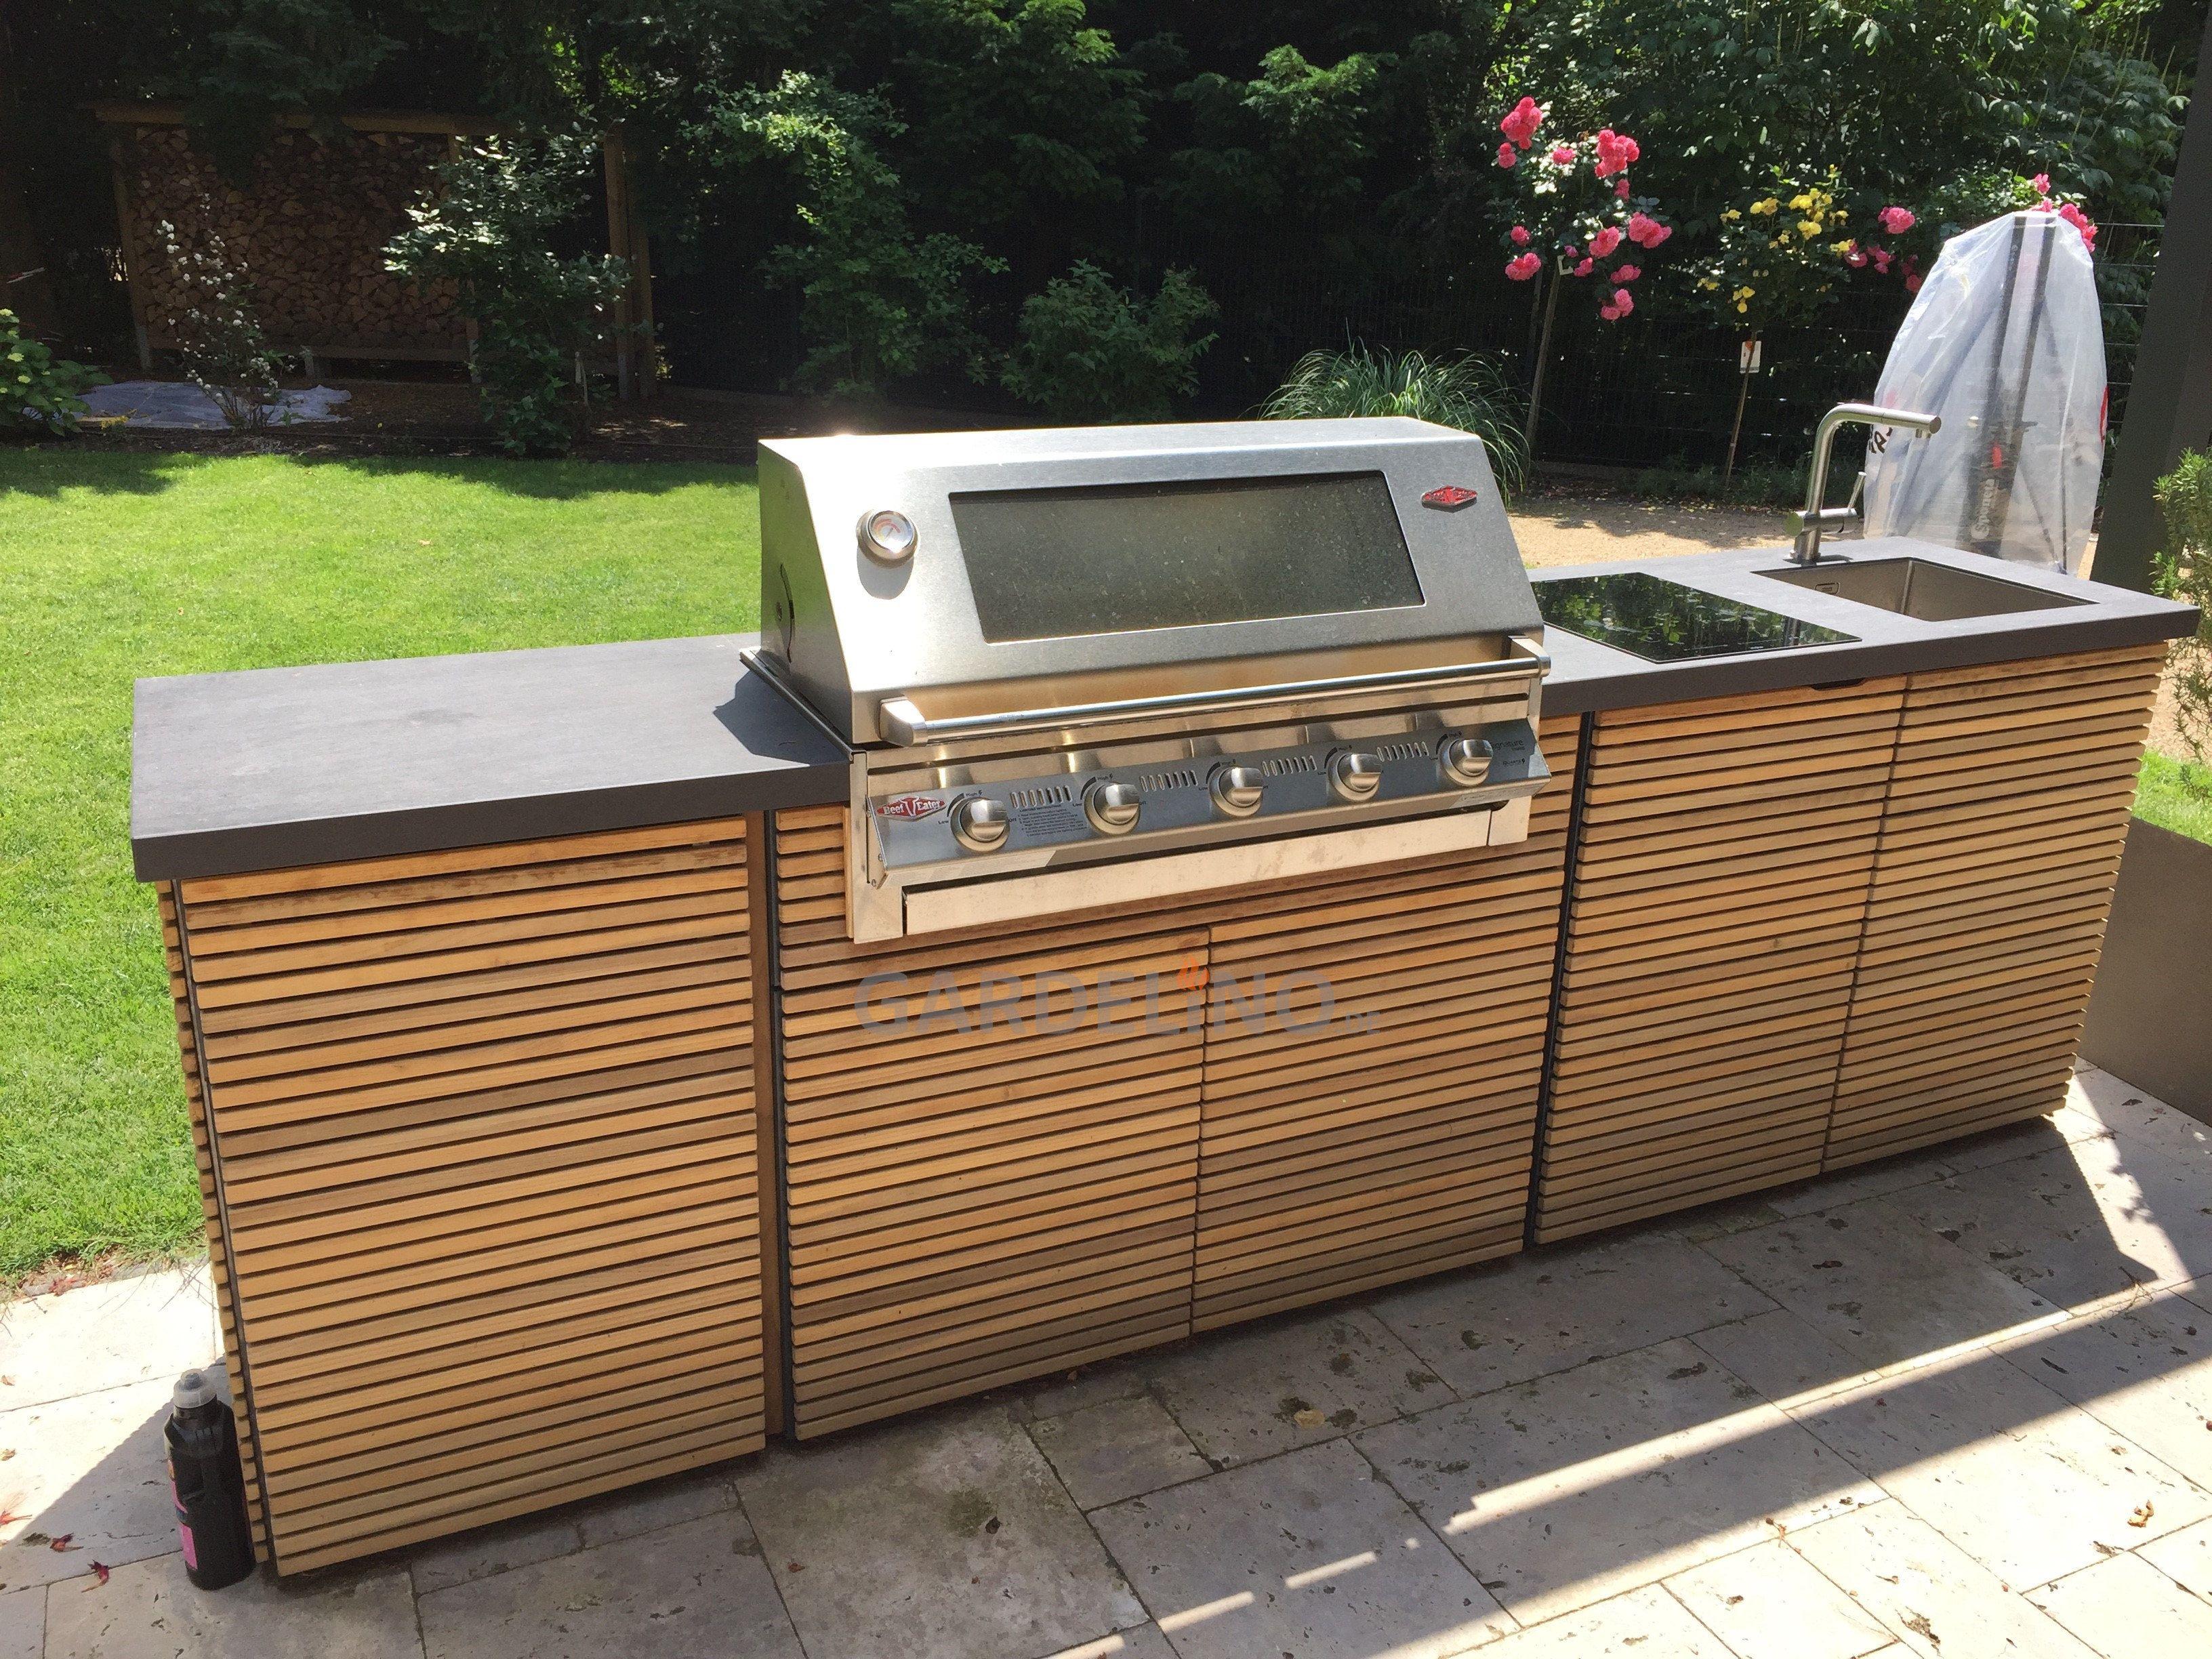 Outdoorküche Holz Preis : Outdoorküche günstig kaufen cafiro